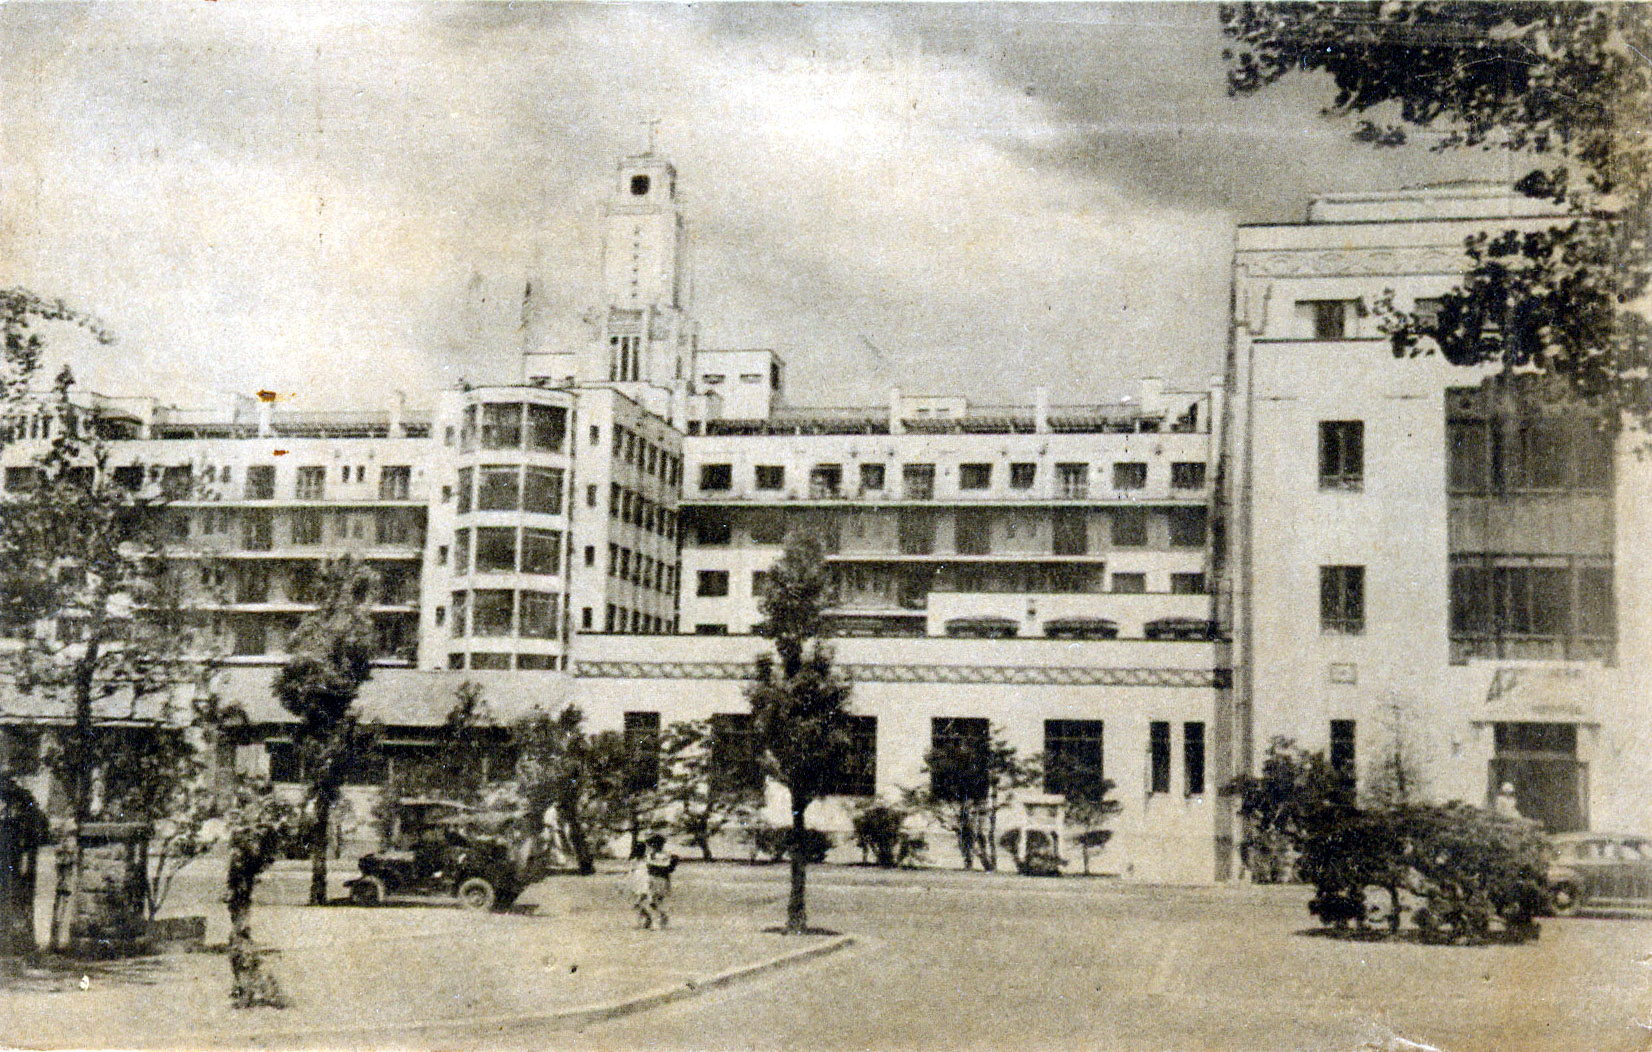 St. Luke's International Hospital, Tsukiji, c. 1945-50 ...